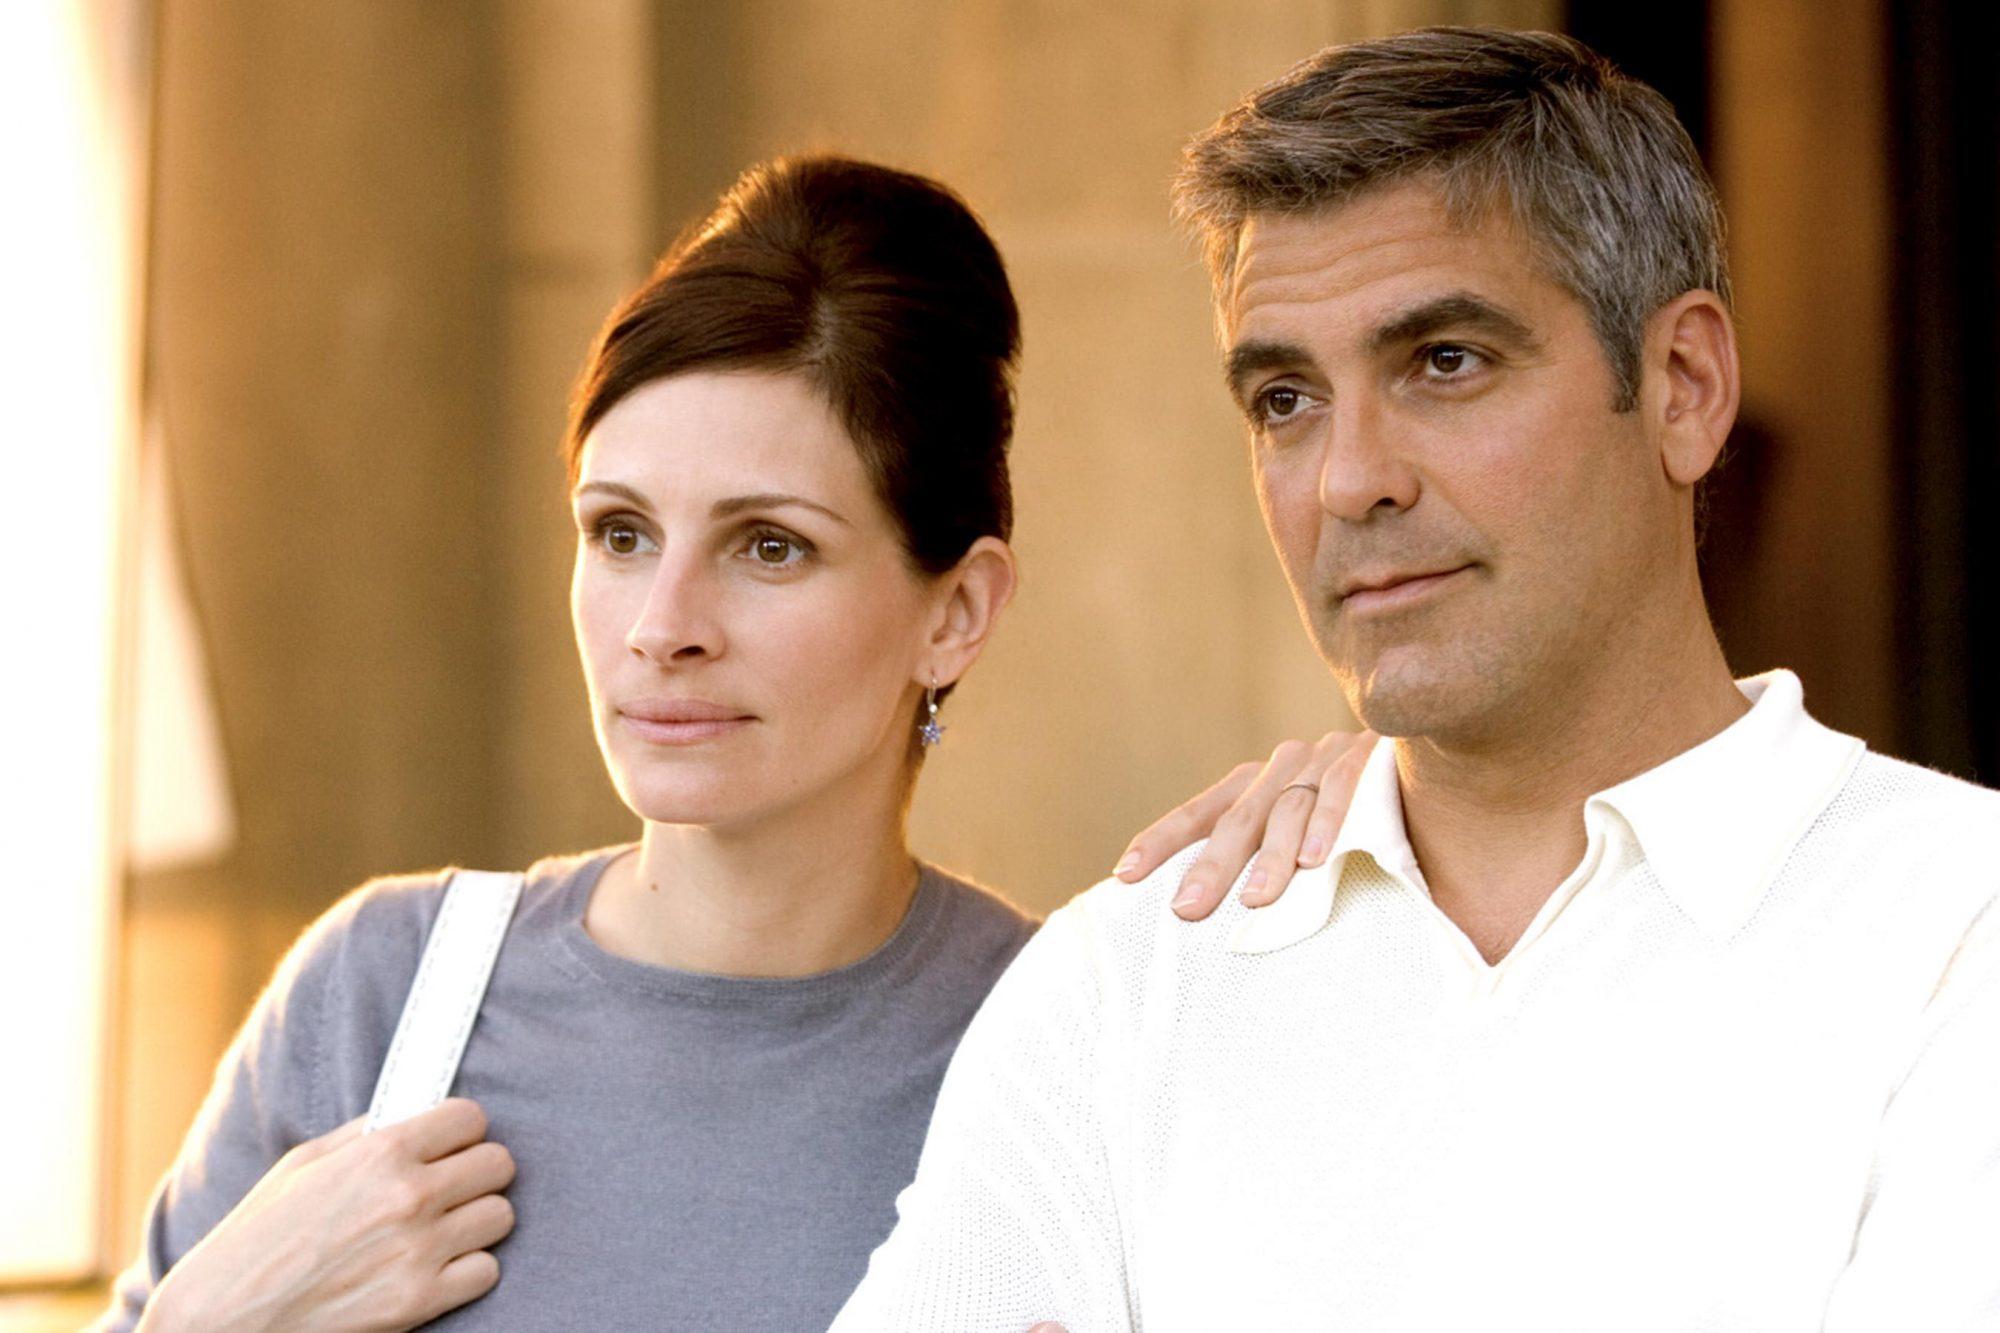 OCEAN'S TWELVE, Julia Roberts, George Clooney, 2004, (c) Warner Brothers/courtesy Everett Collection